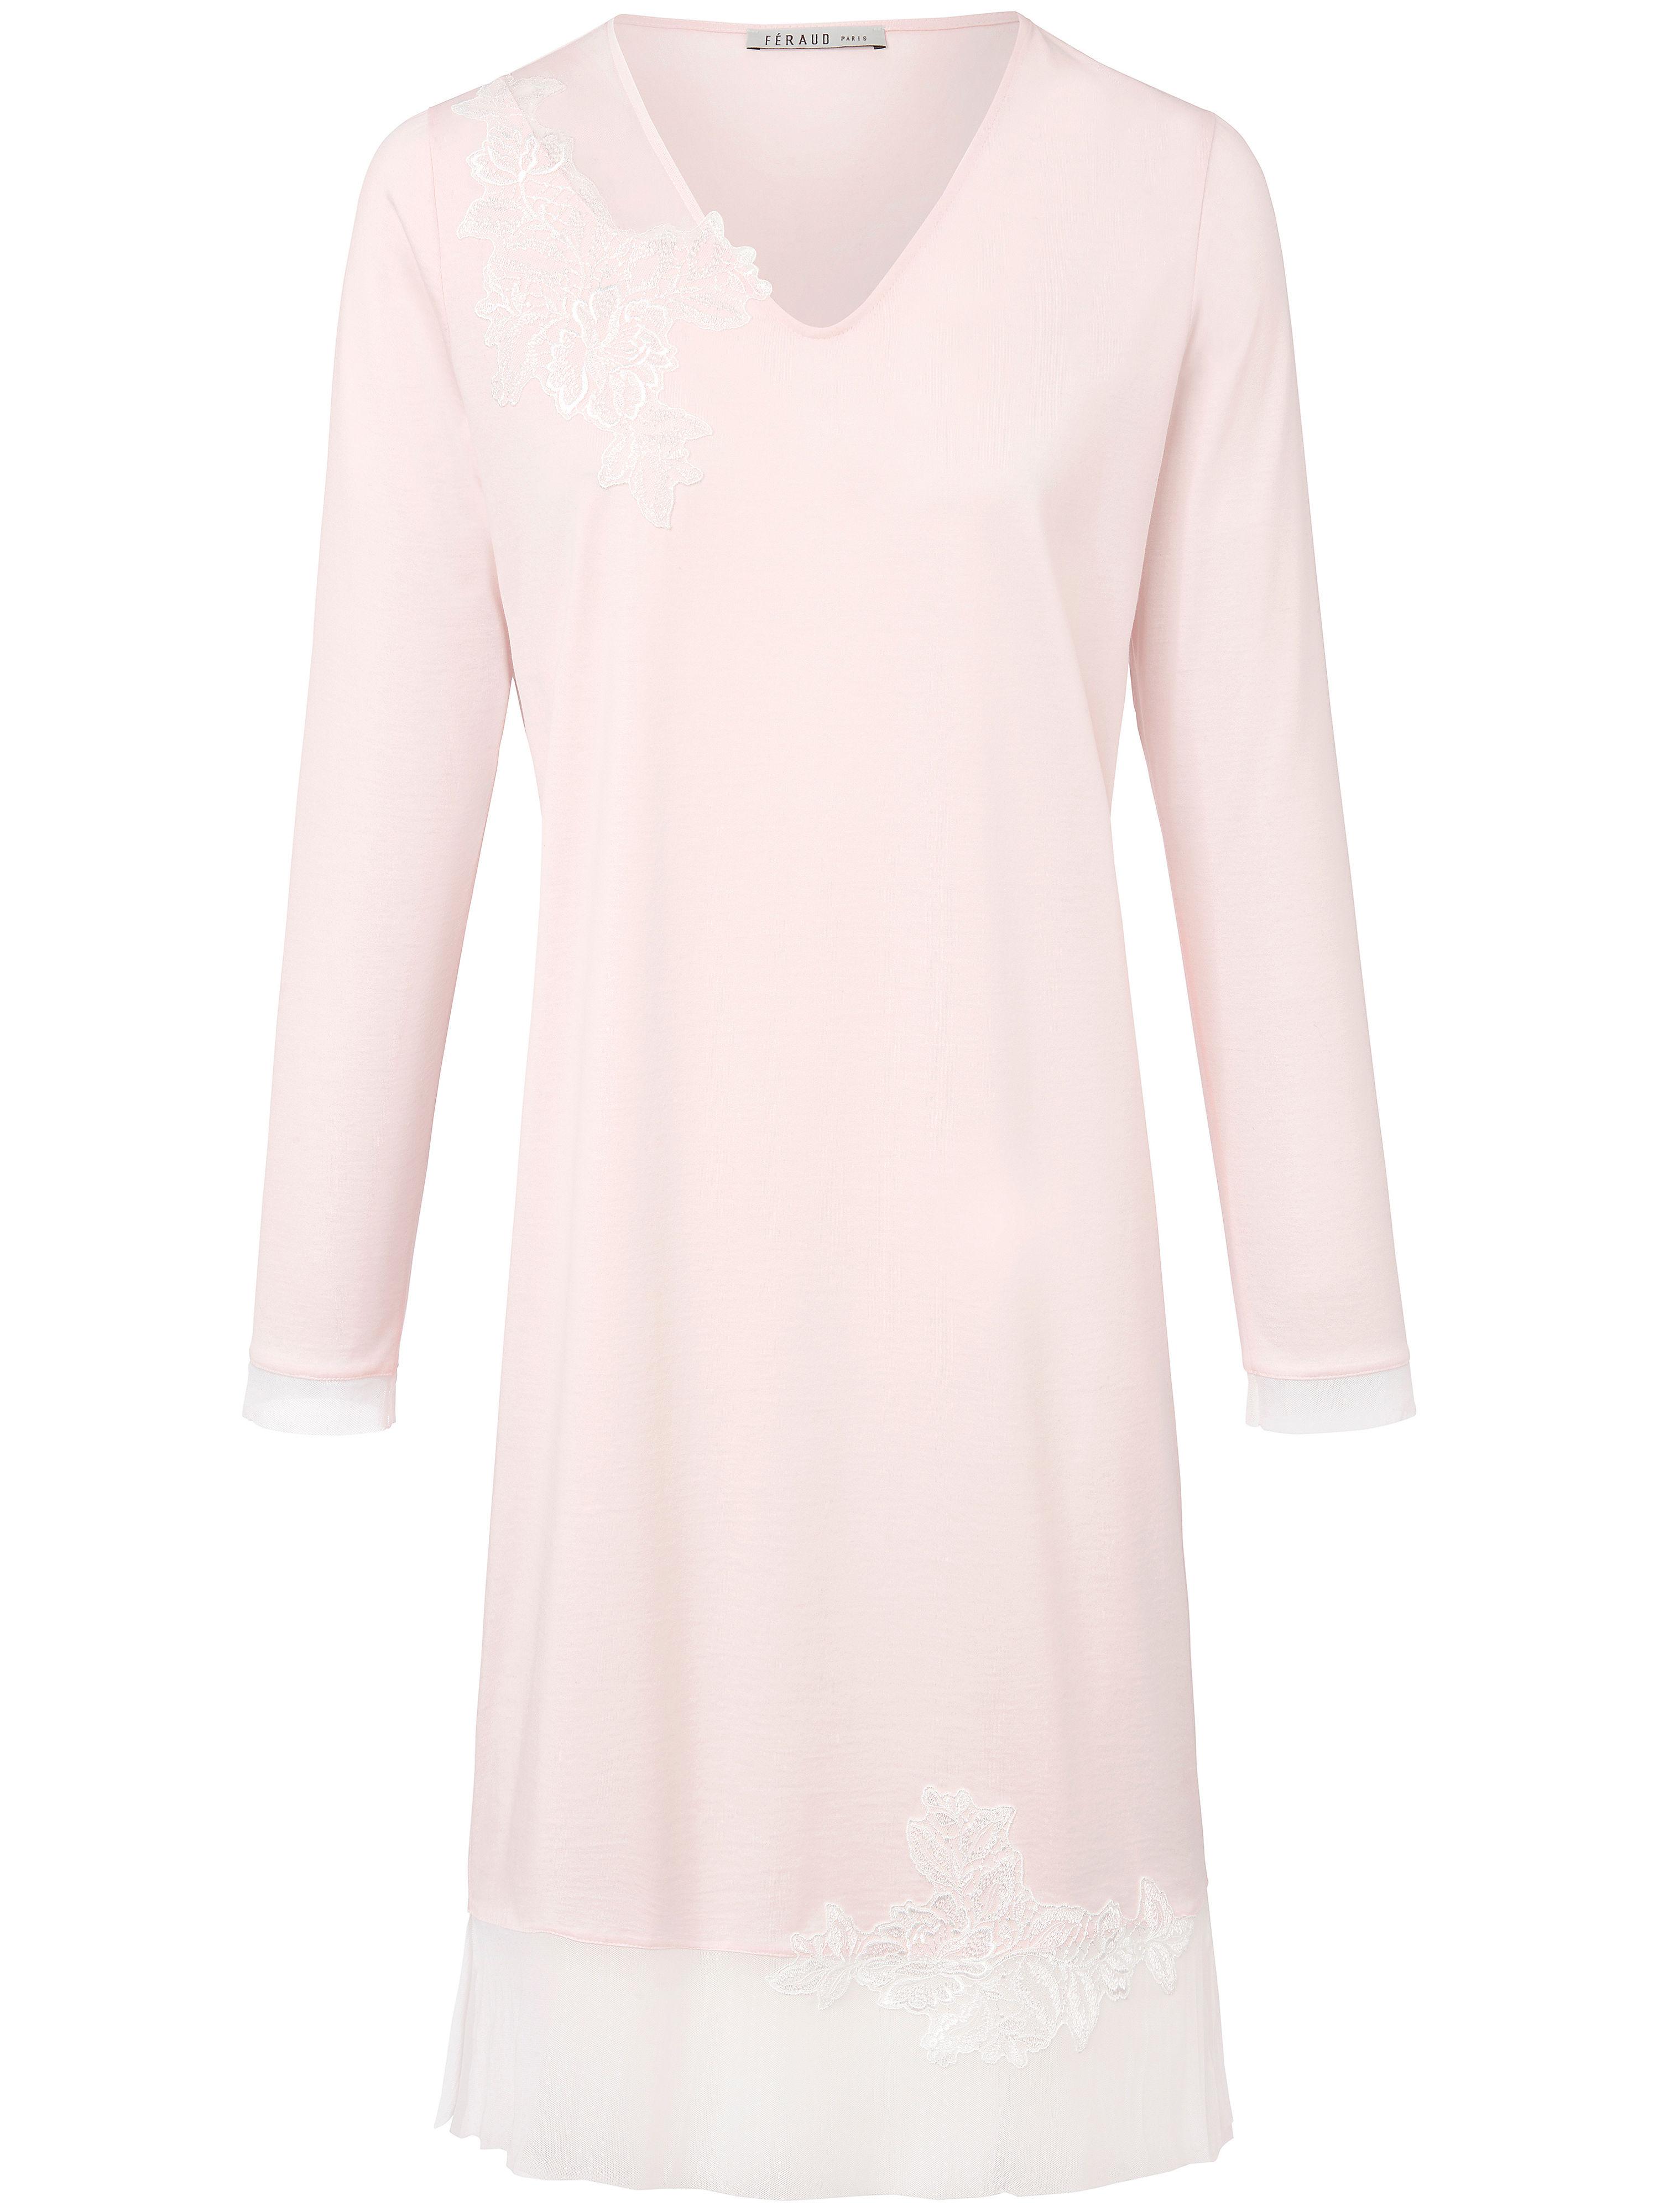 La chemise nuit 100% coton  Féraud rose